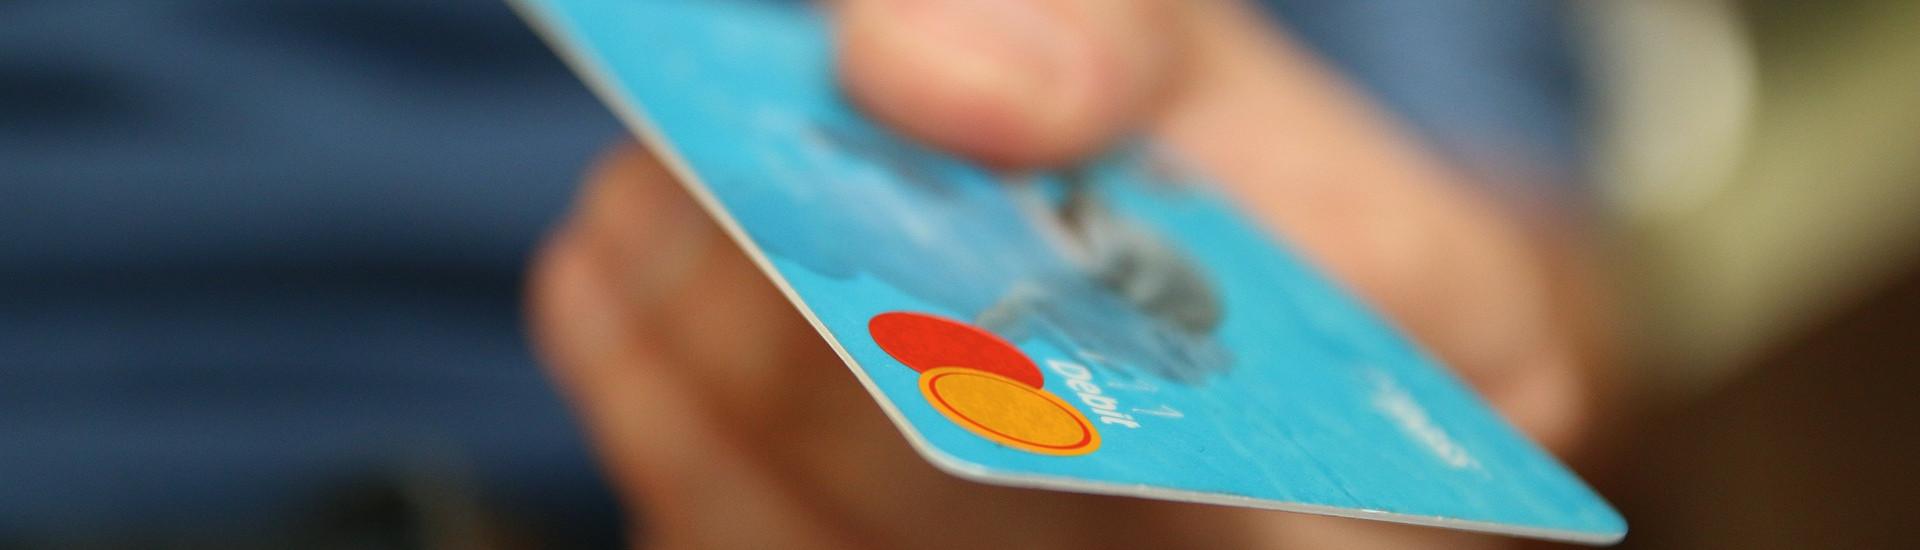 tarjetas-revolving-pago-con-tarjeta-slider